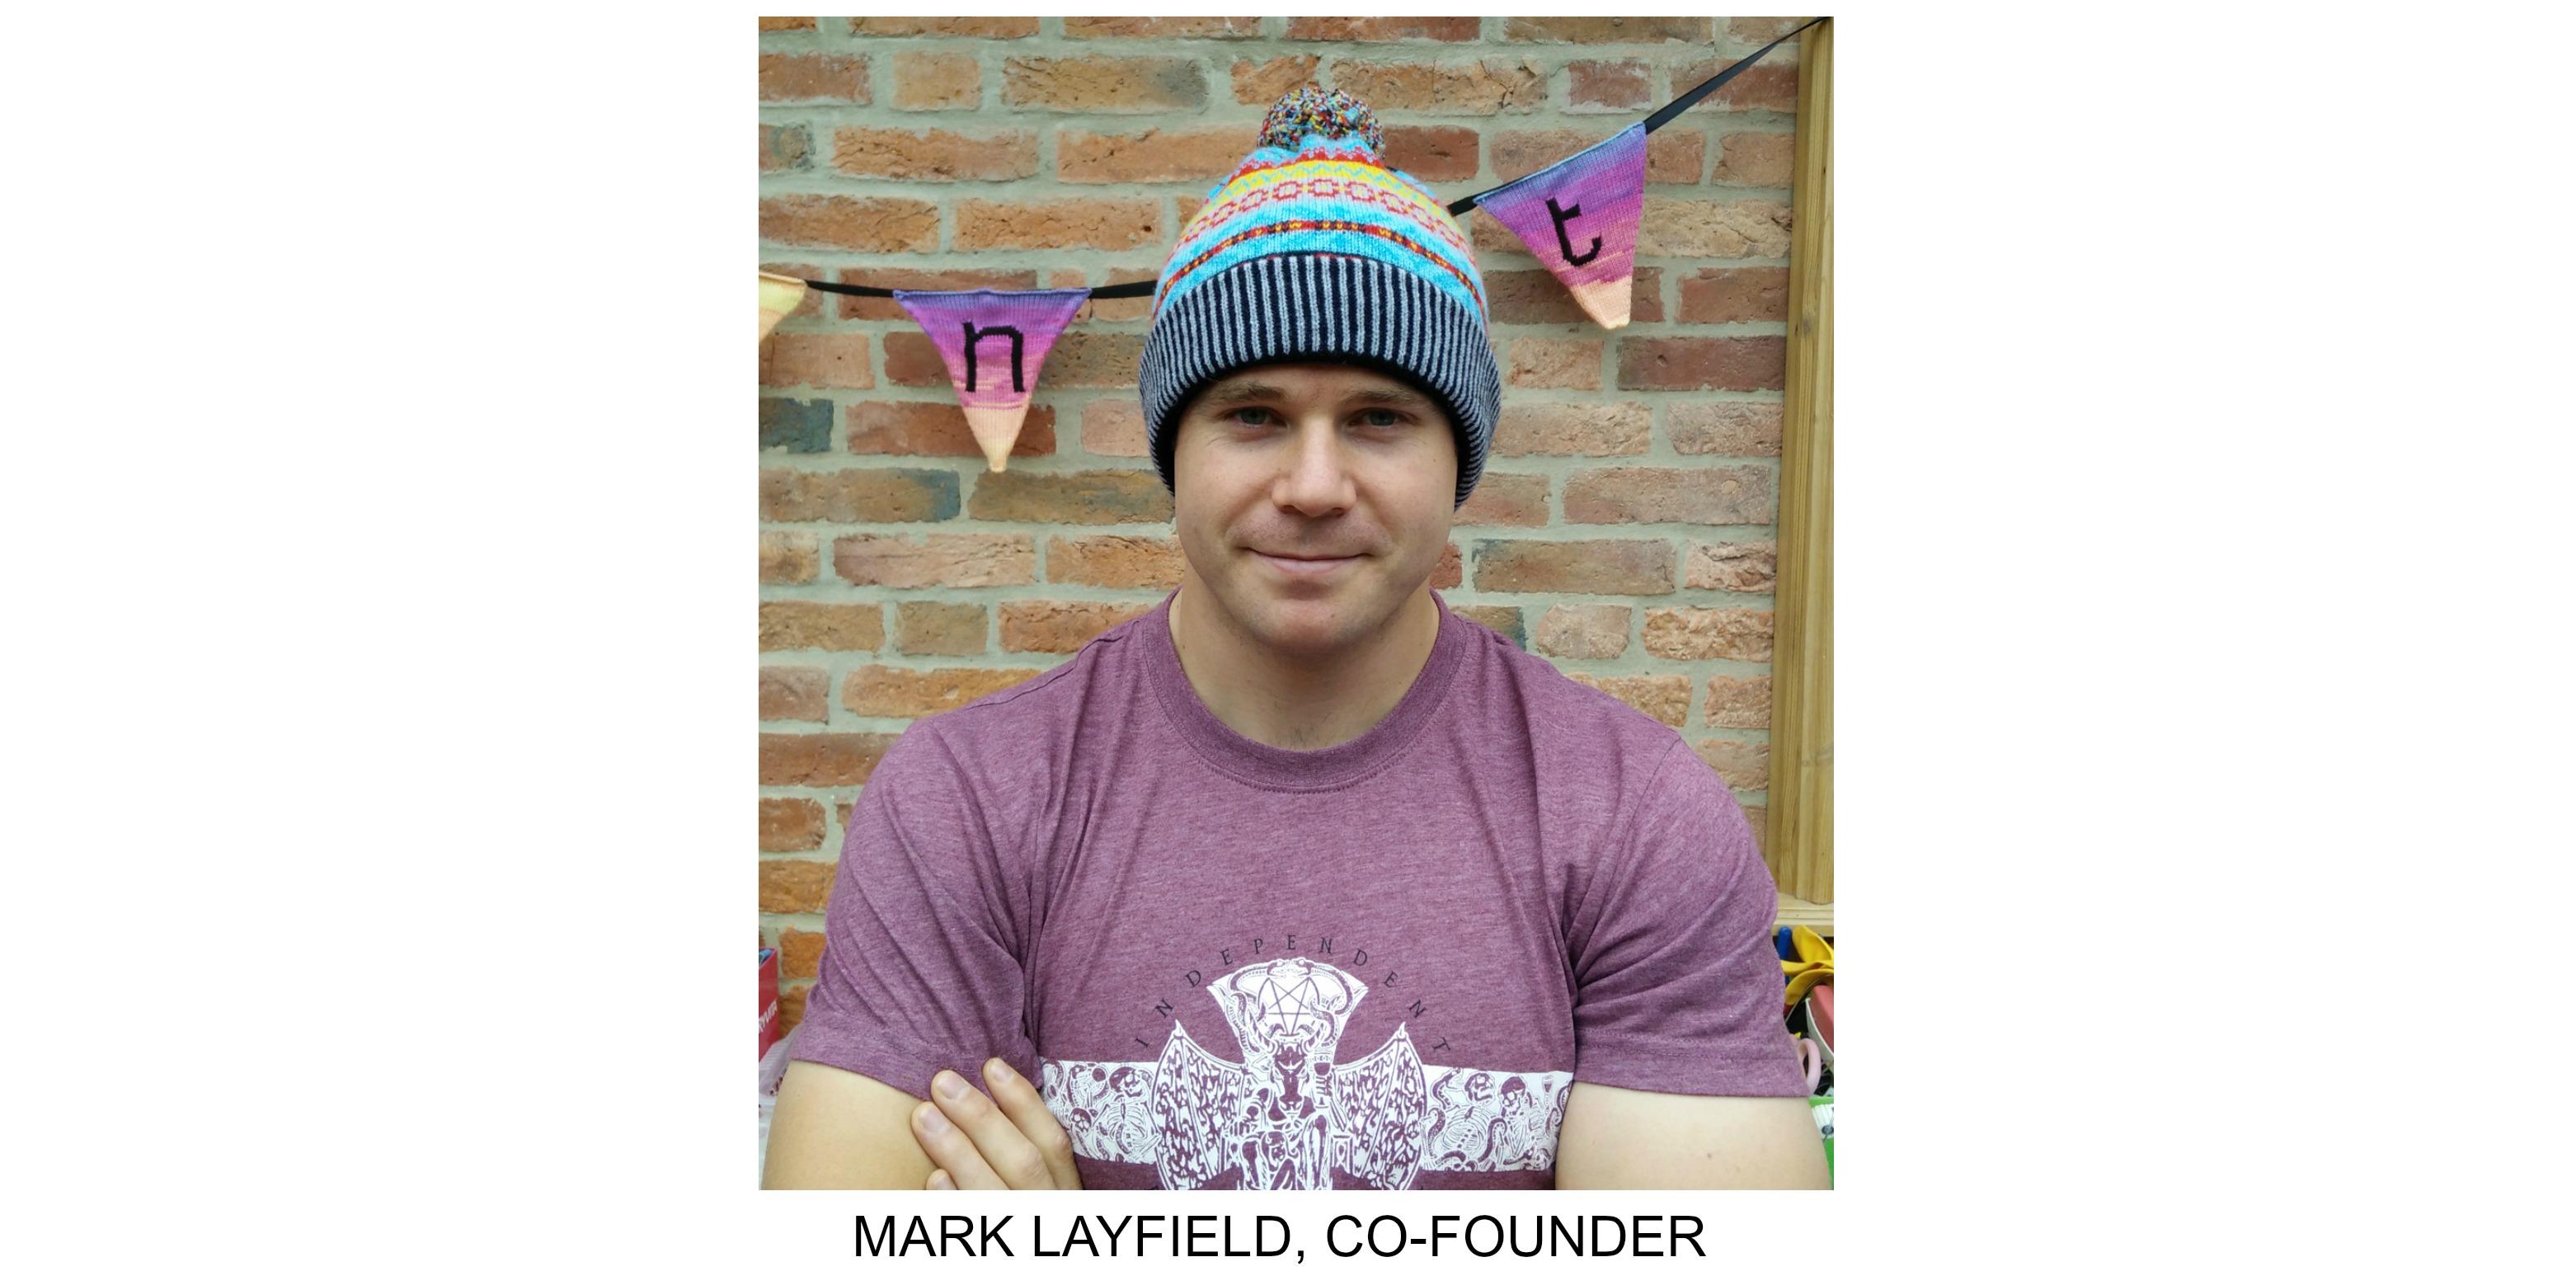 Mark Layfield